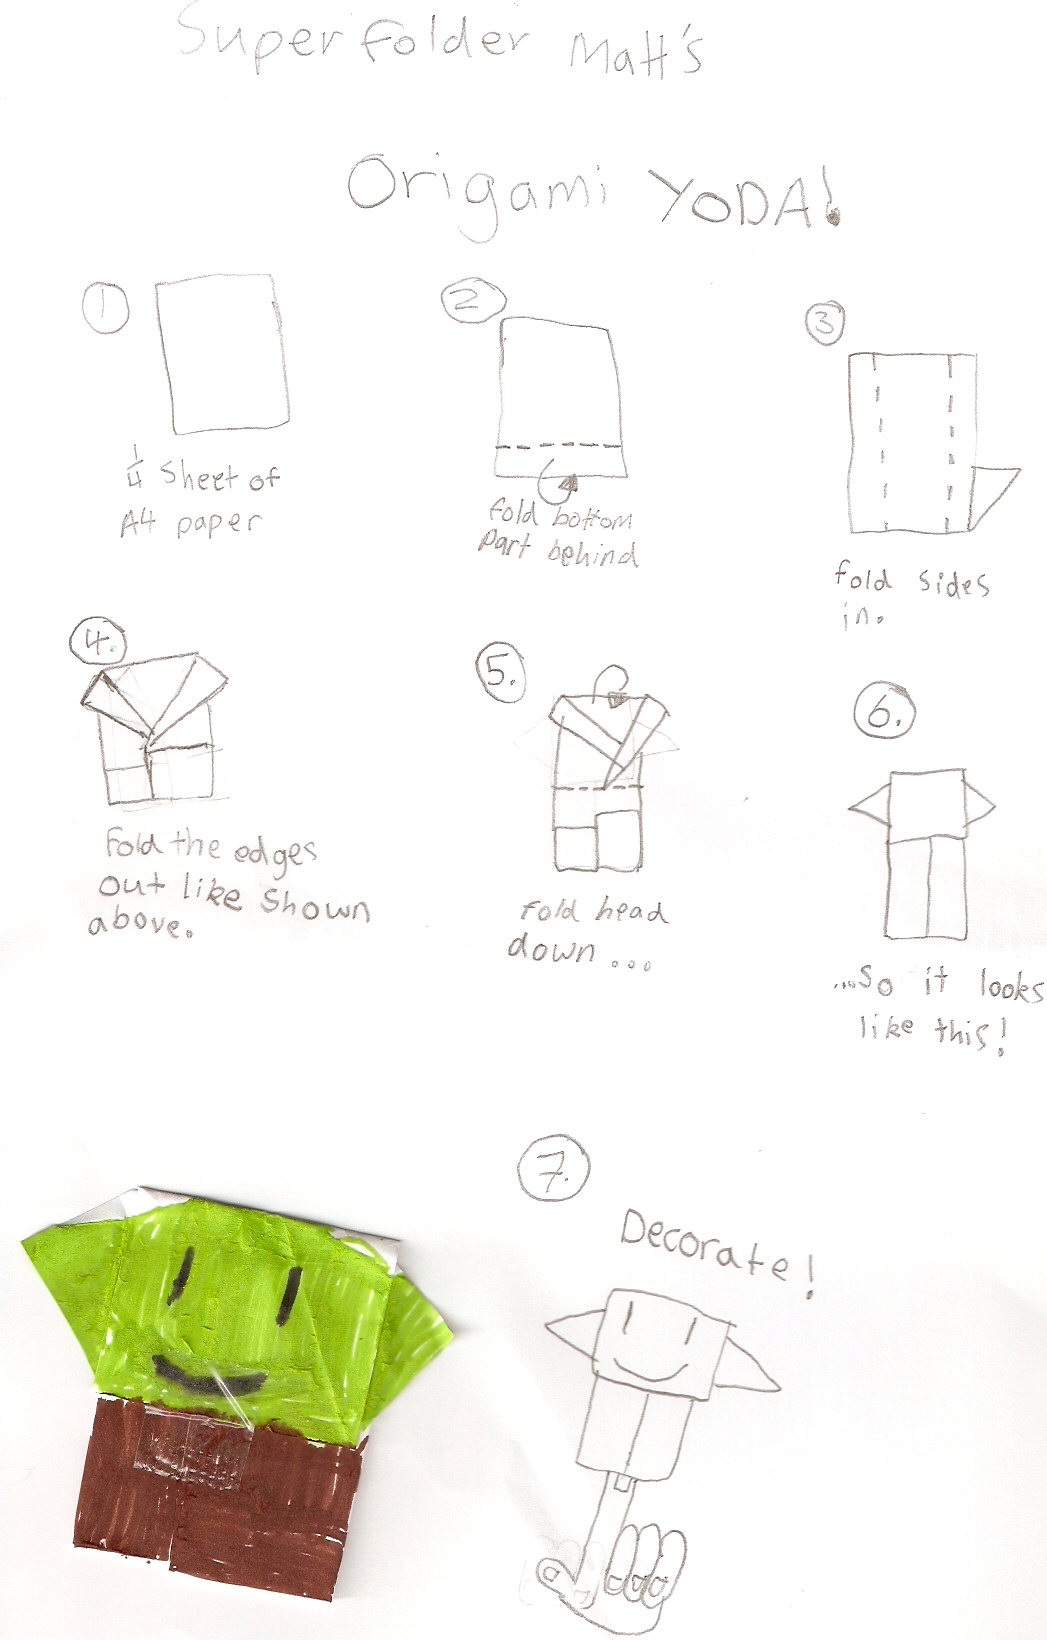 Tom Angleberger's Blog - SF MattQ's Origami Yoda instrux ... - photo#19